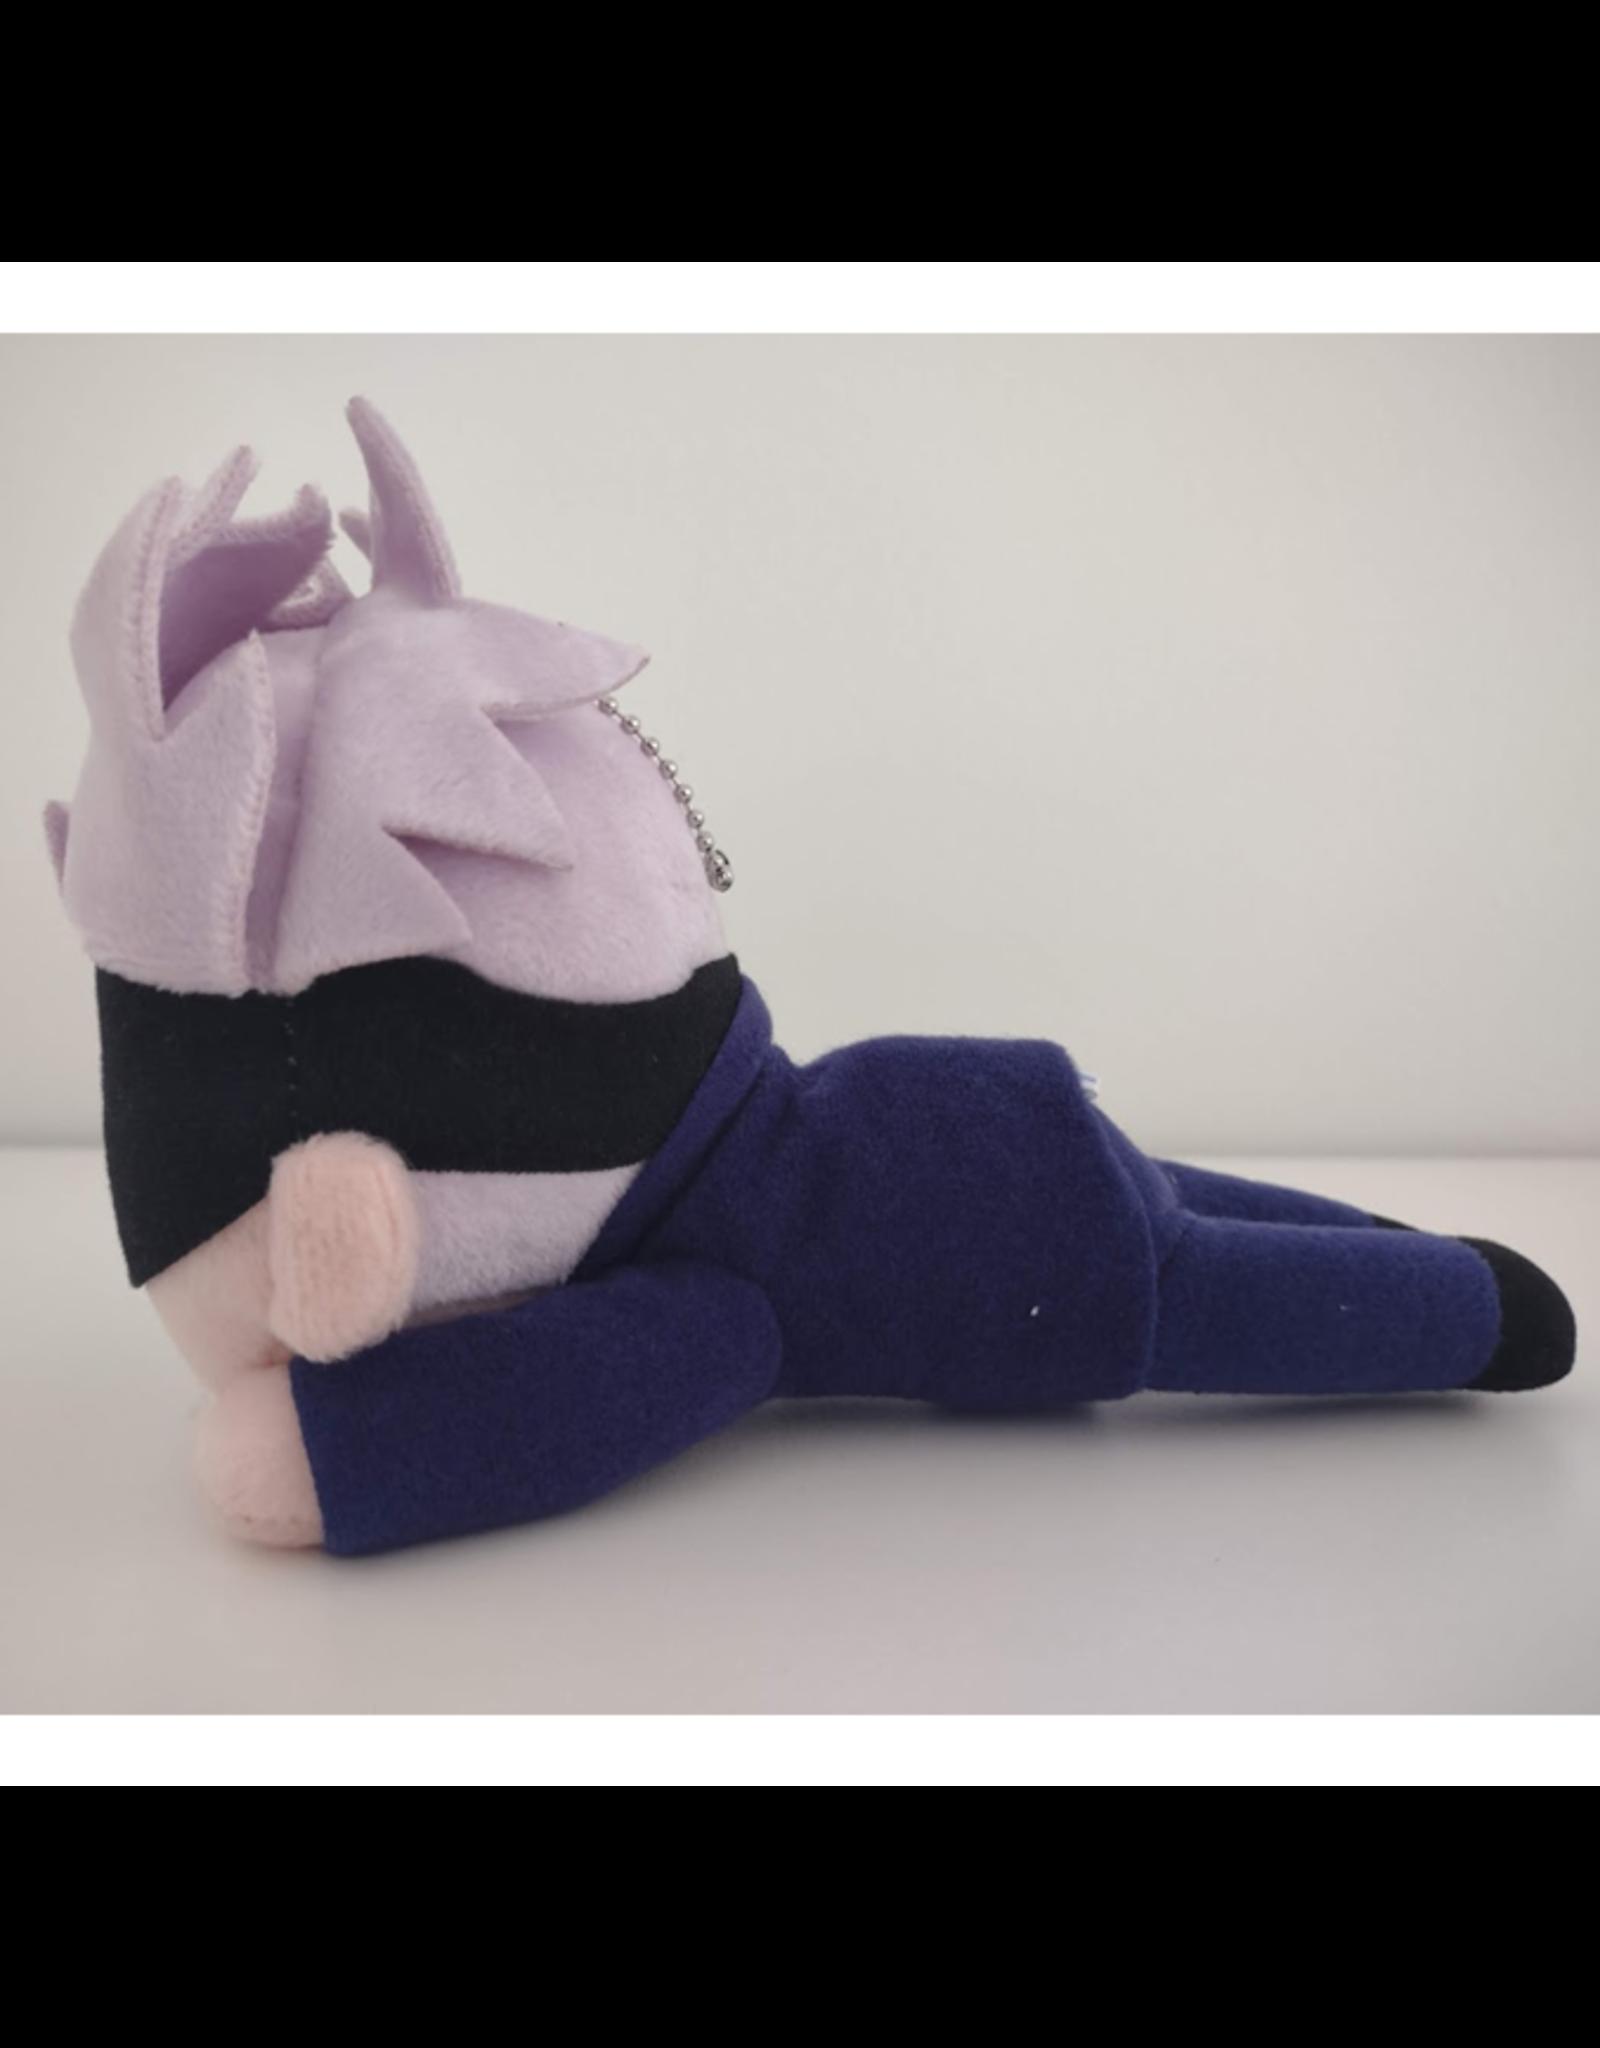 Jujutsu Kaisen - Satoru Gojo - Nesoberi Plush (S) - 16 cm